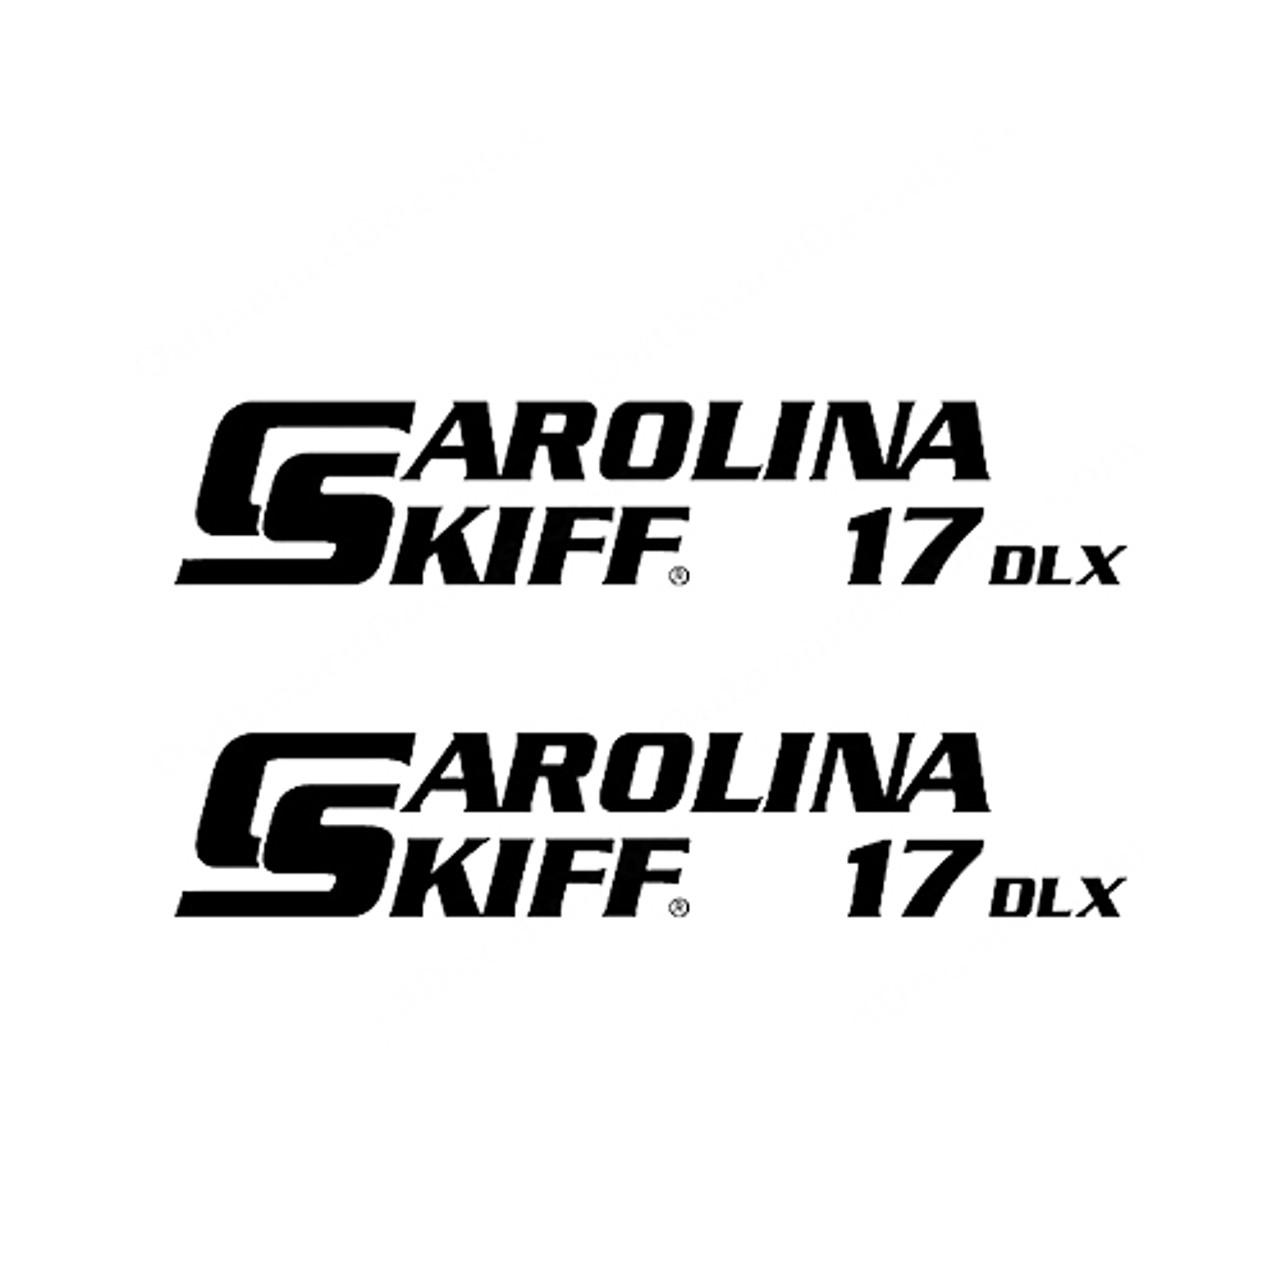 Carolina Skiff 17 Dlx Boat Vinyl Decal Kit